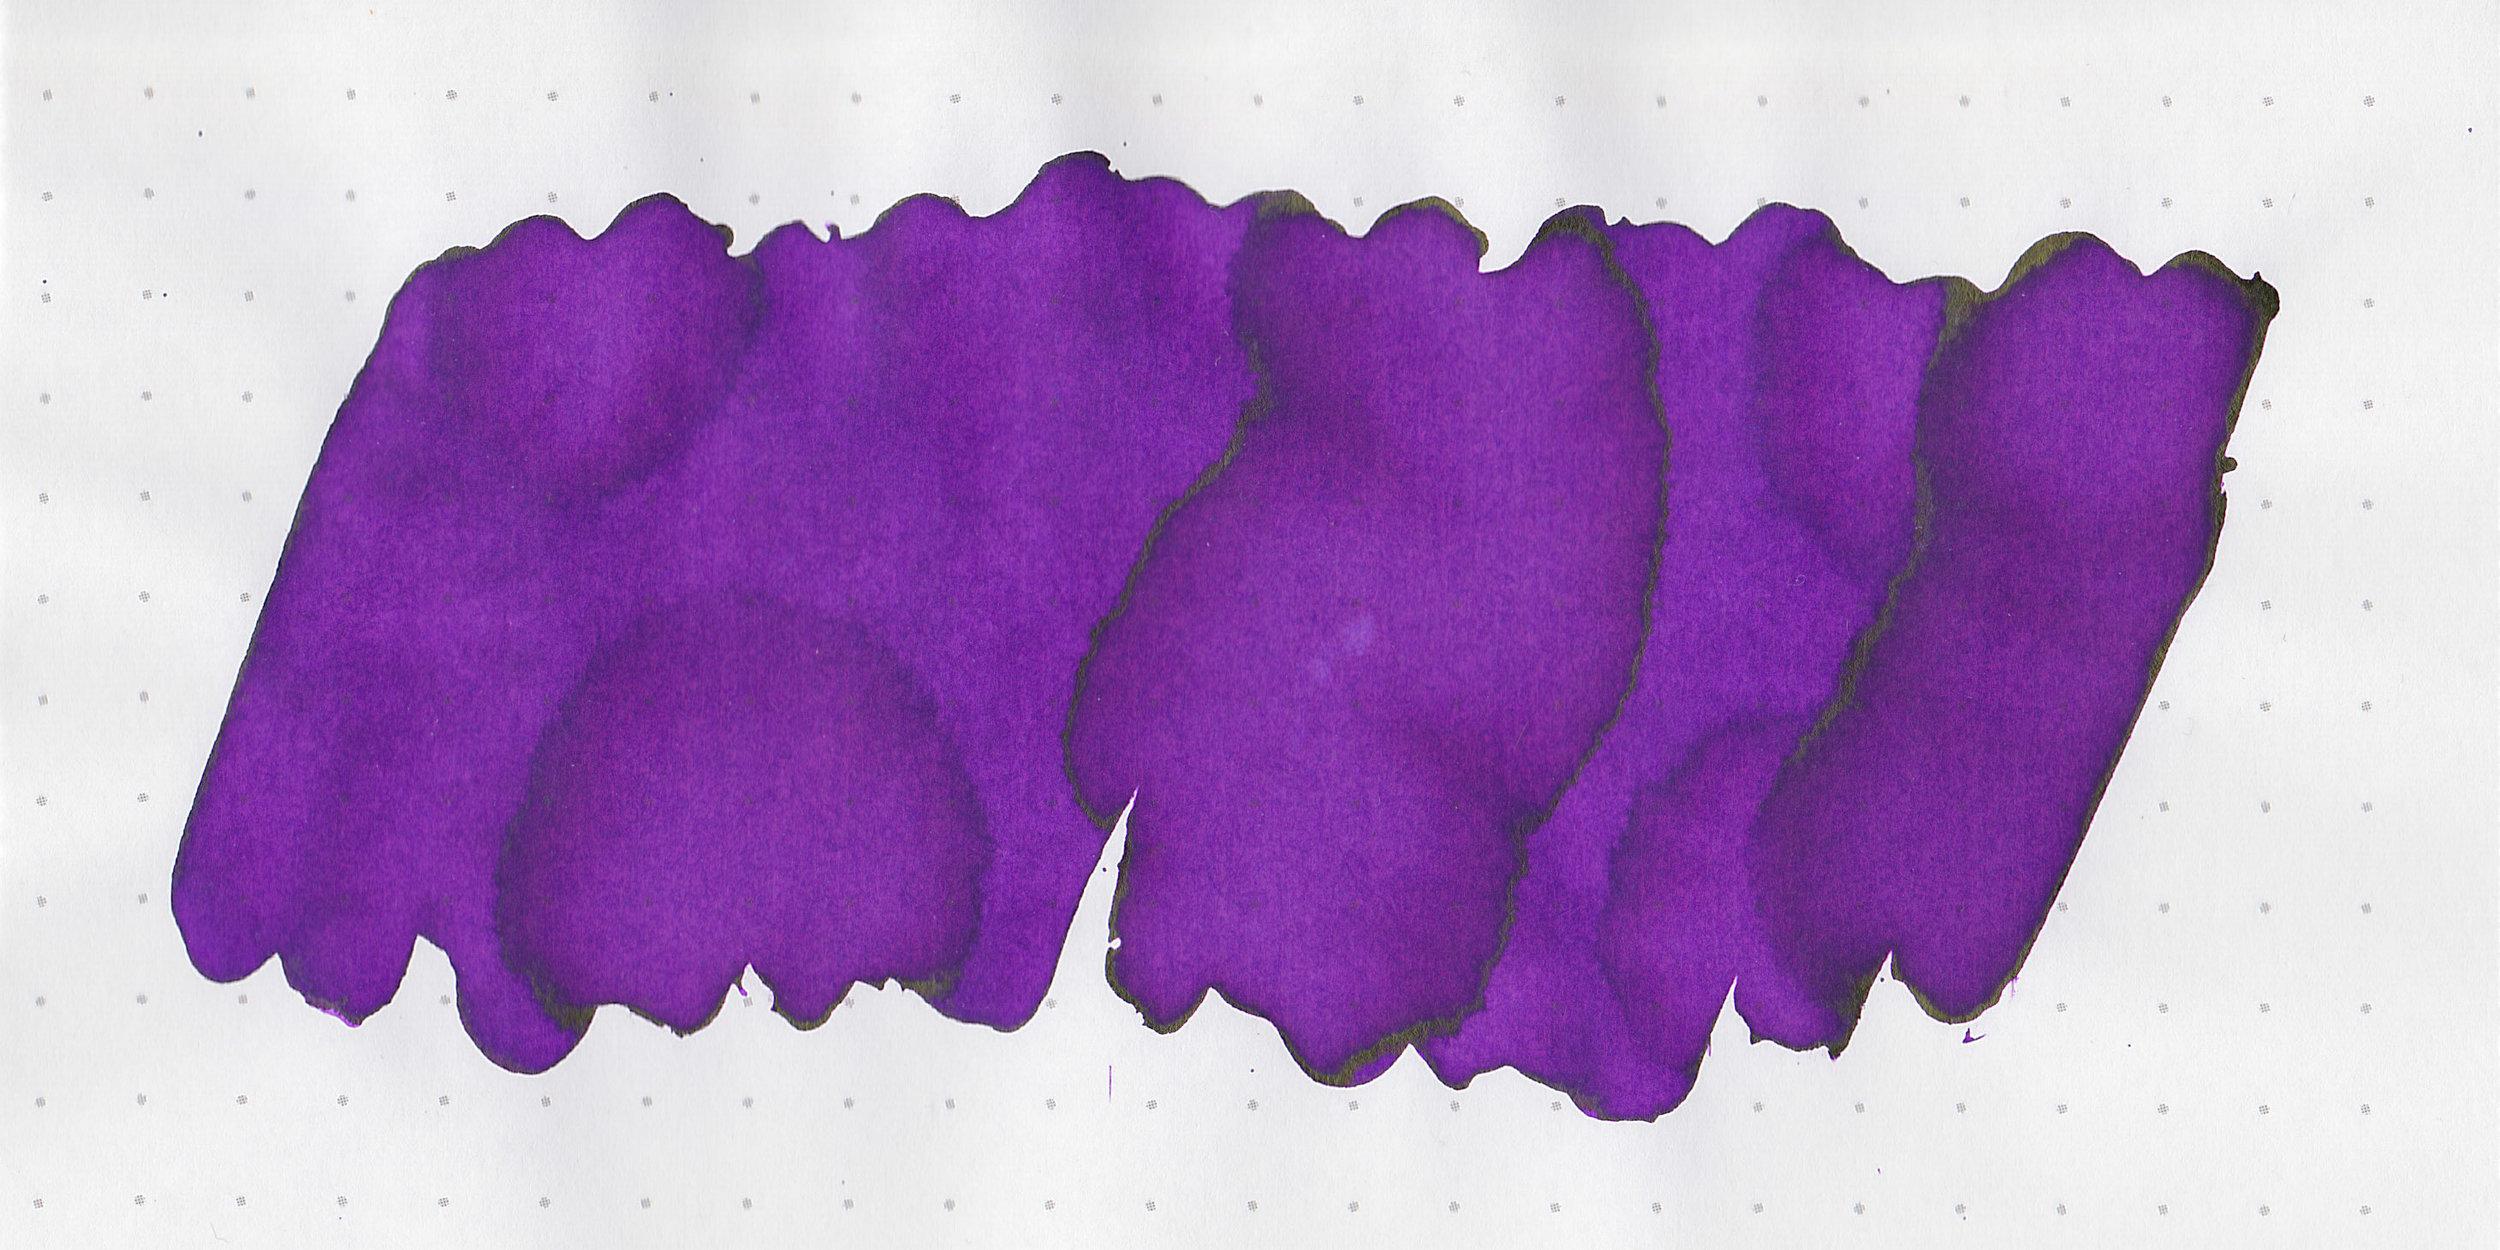 tac-murasaki-purple-5.jpg